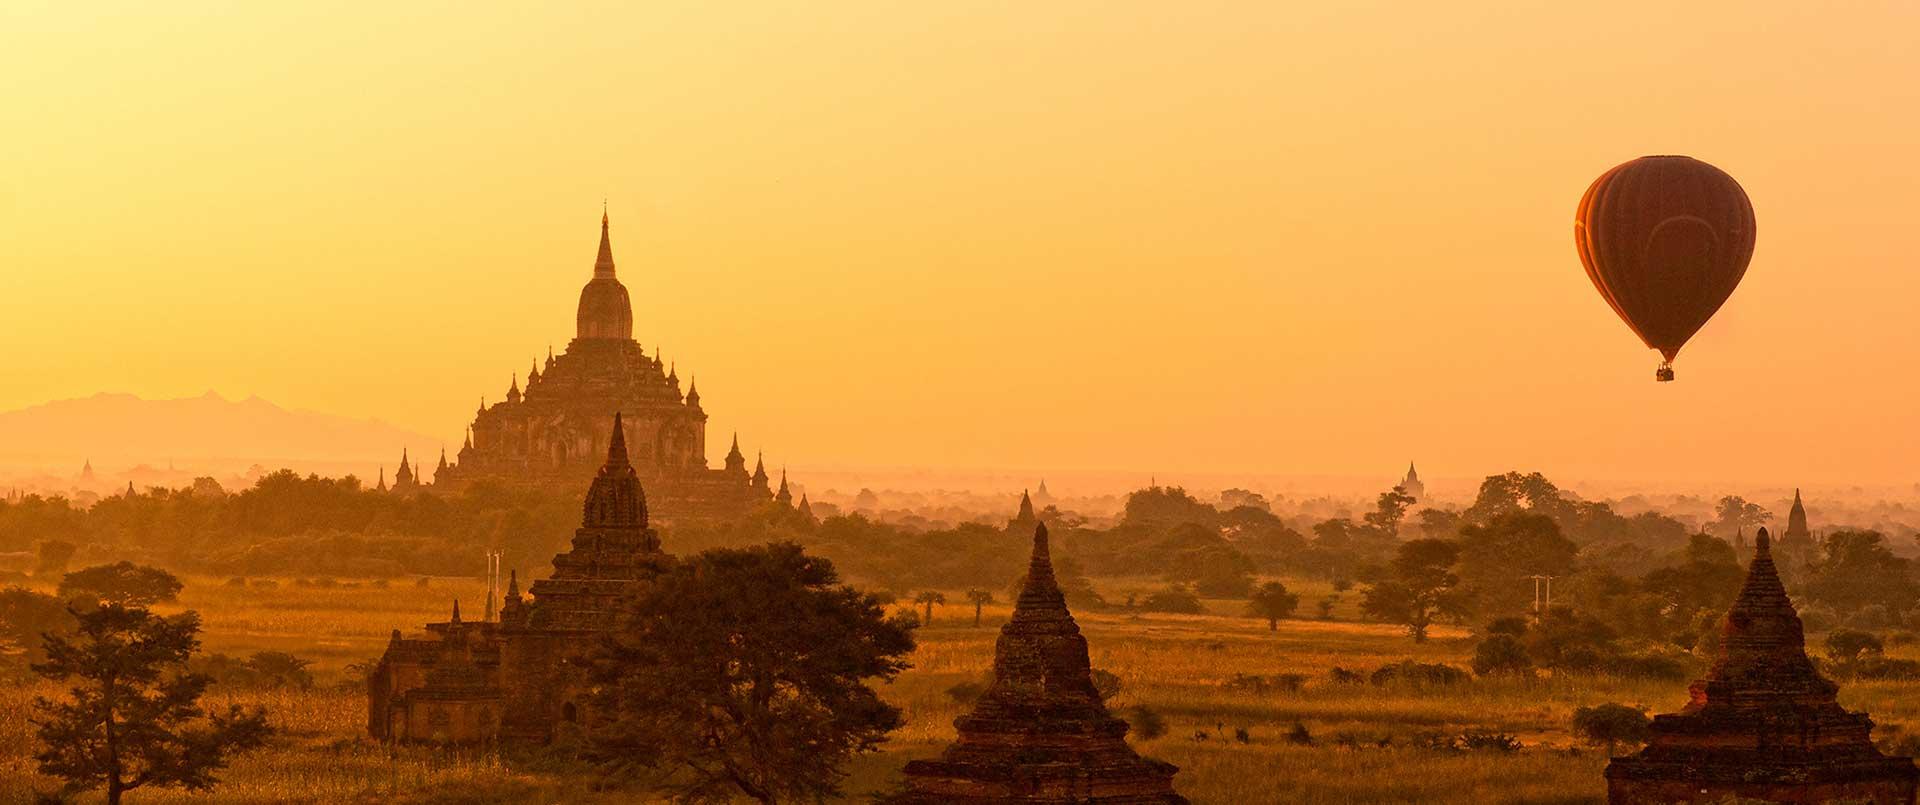 Myanmar: the Golden Triangle